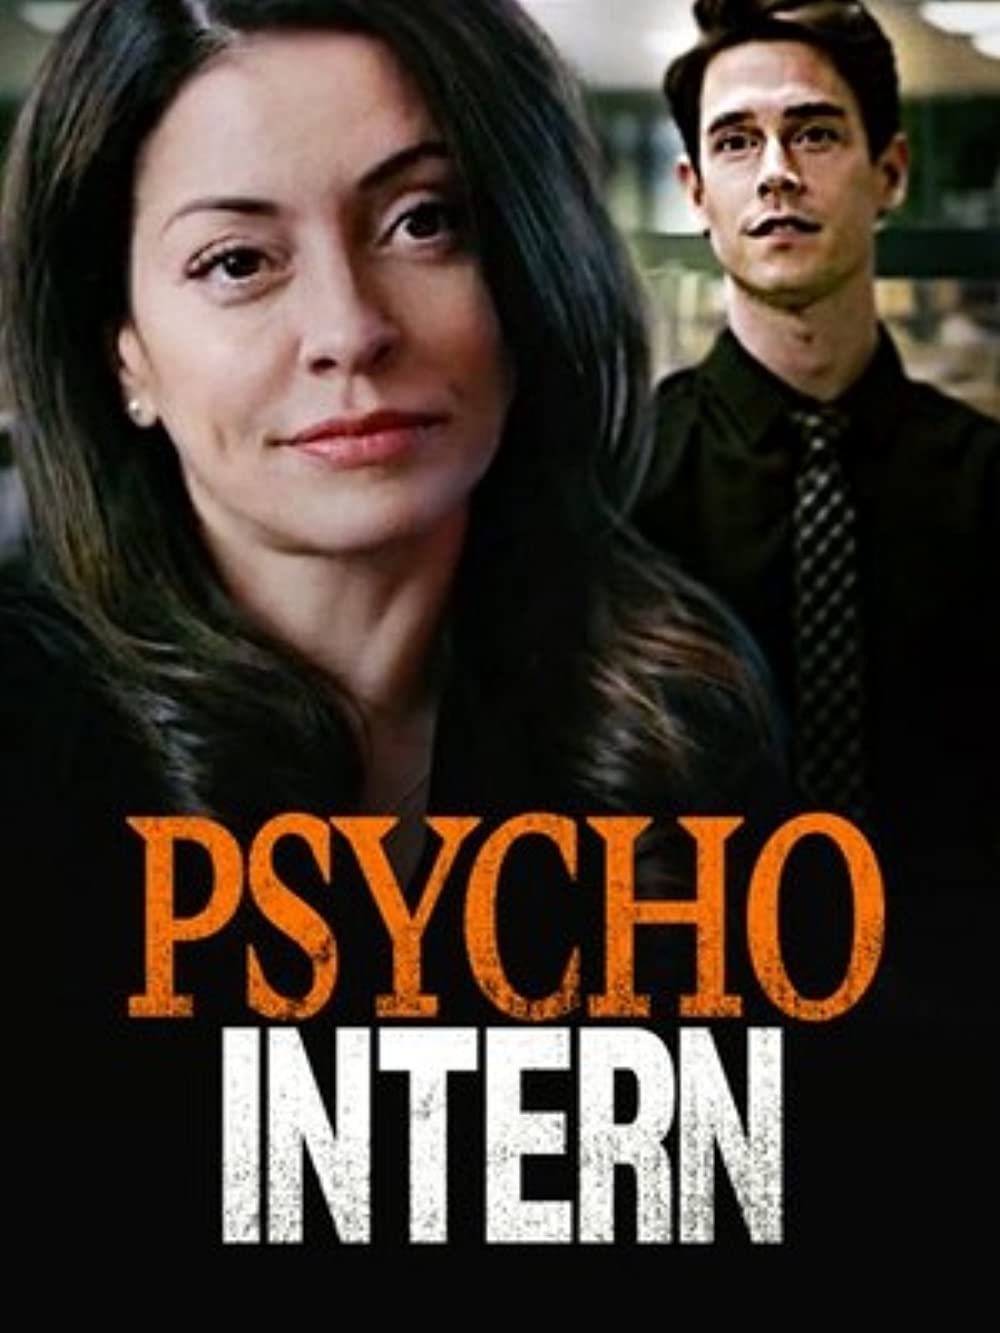 Psycho Intern